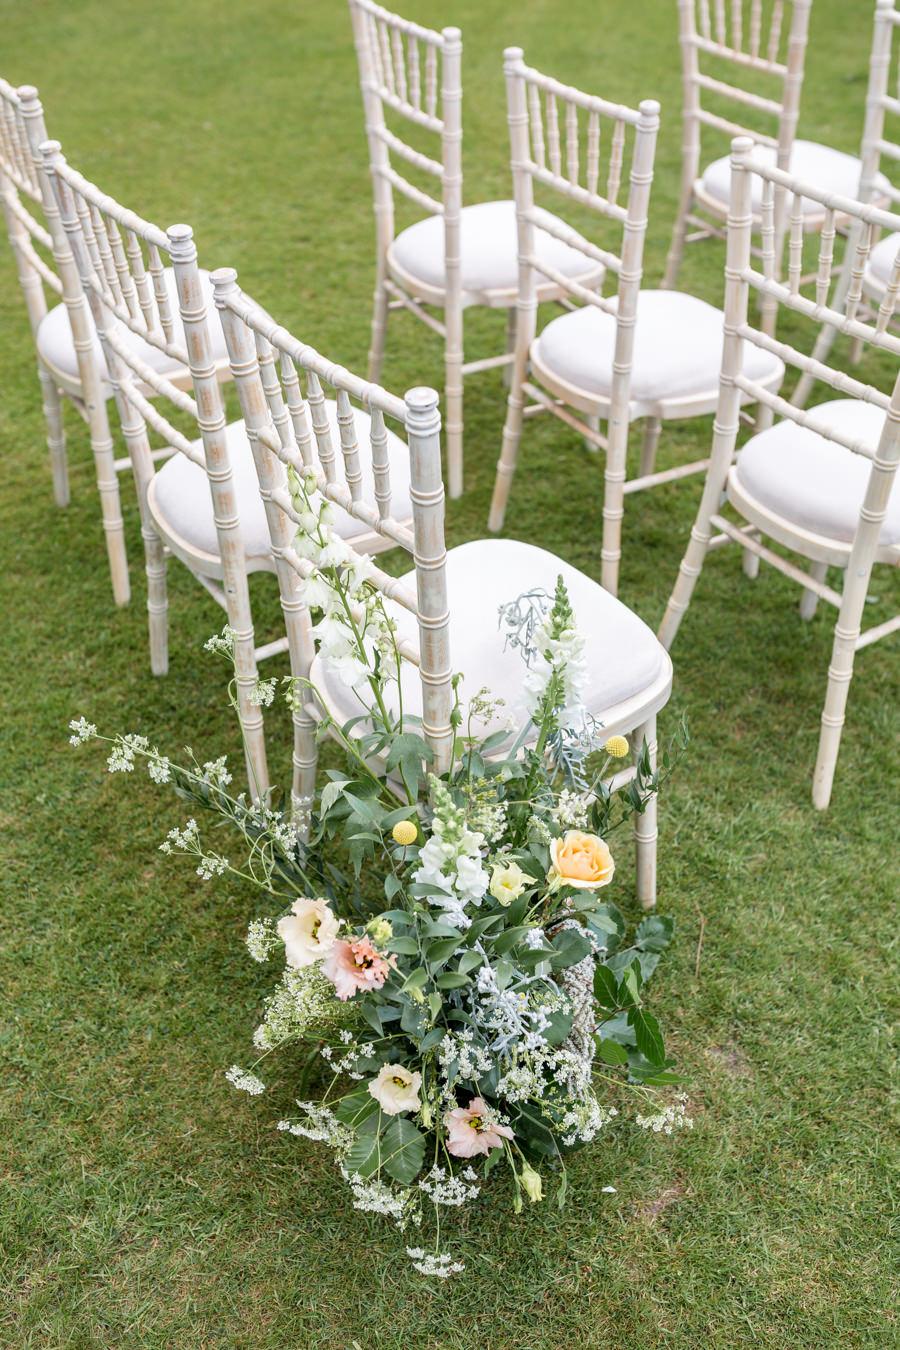 Boho luxe wedding style with soft orange and muted tones at Chippenham, image credit Heather Jackson Photography (7)